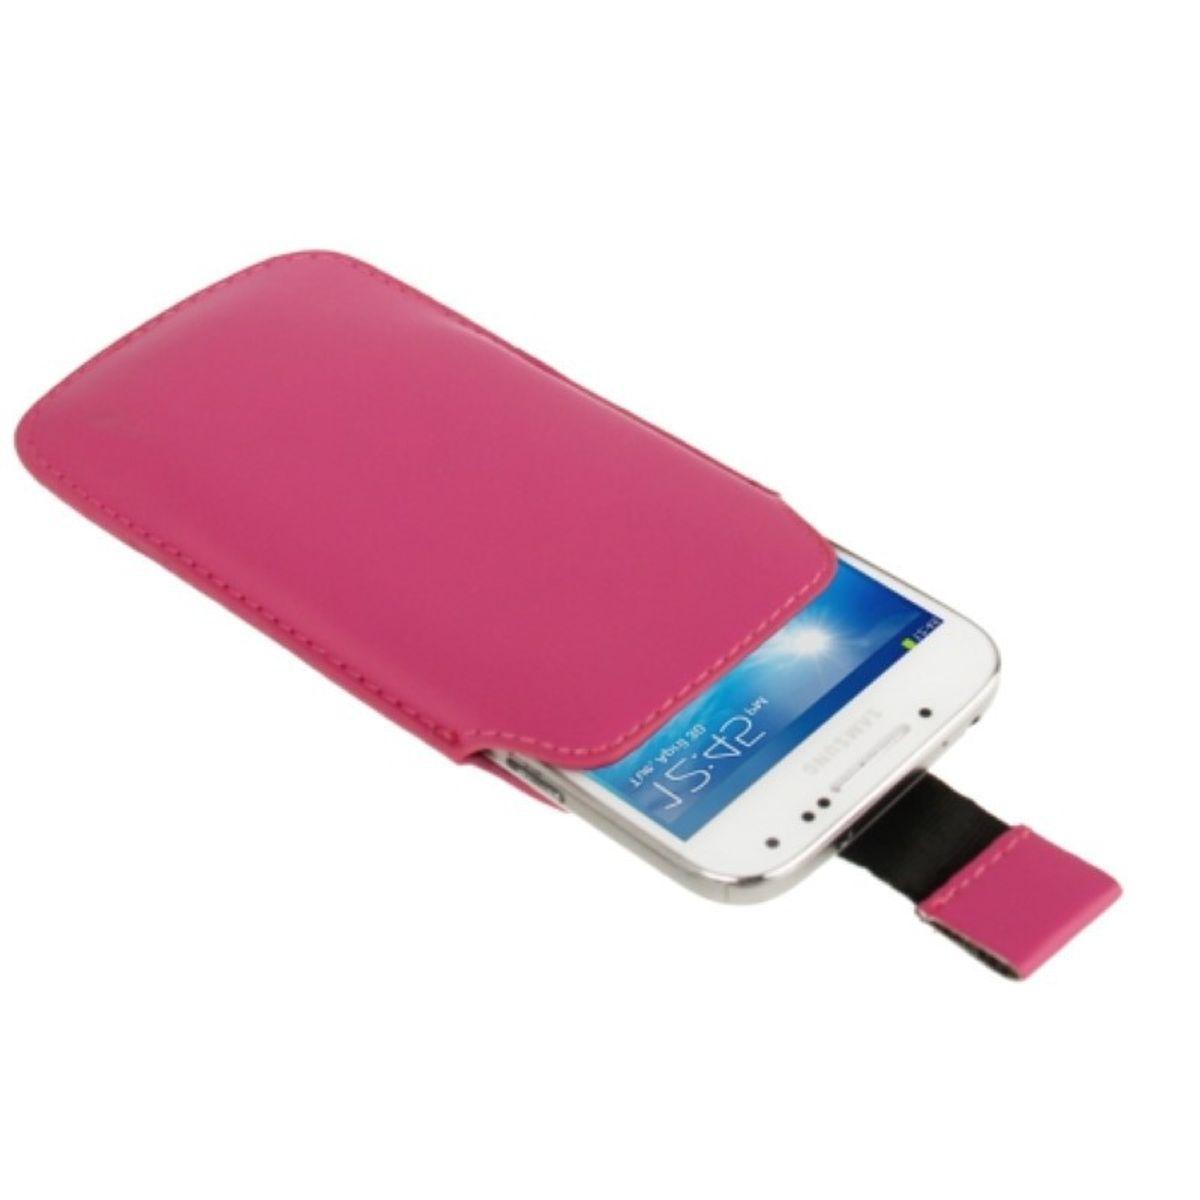 Handyhülle Tasche Slide Hülle Pink